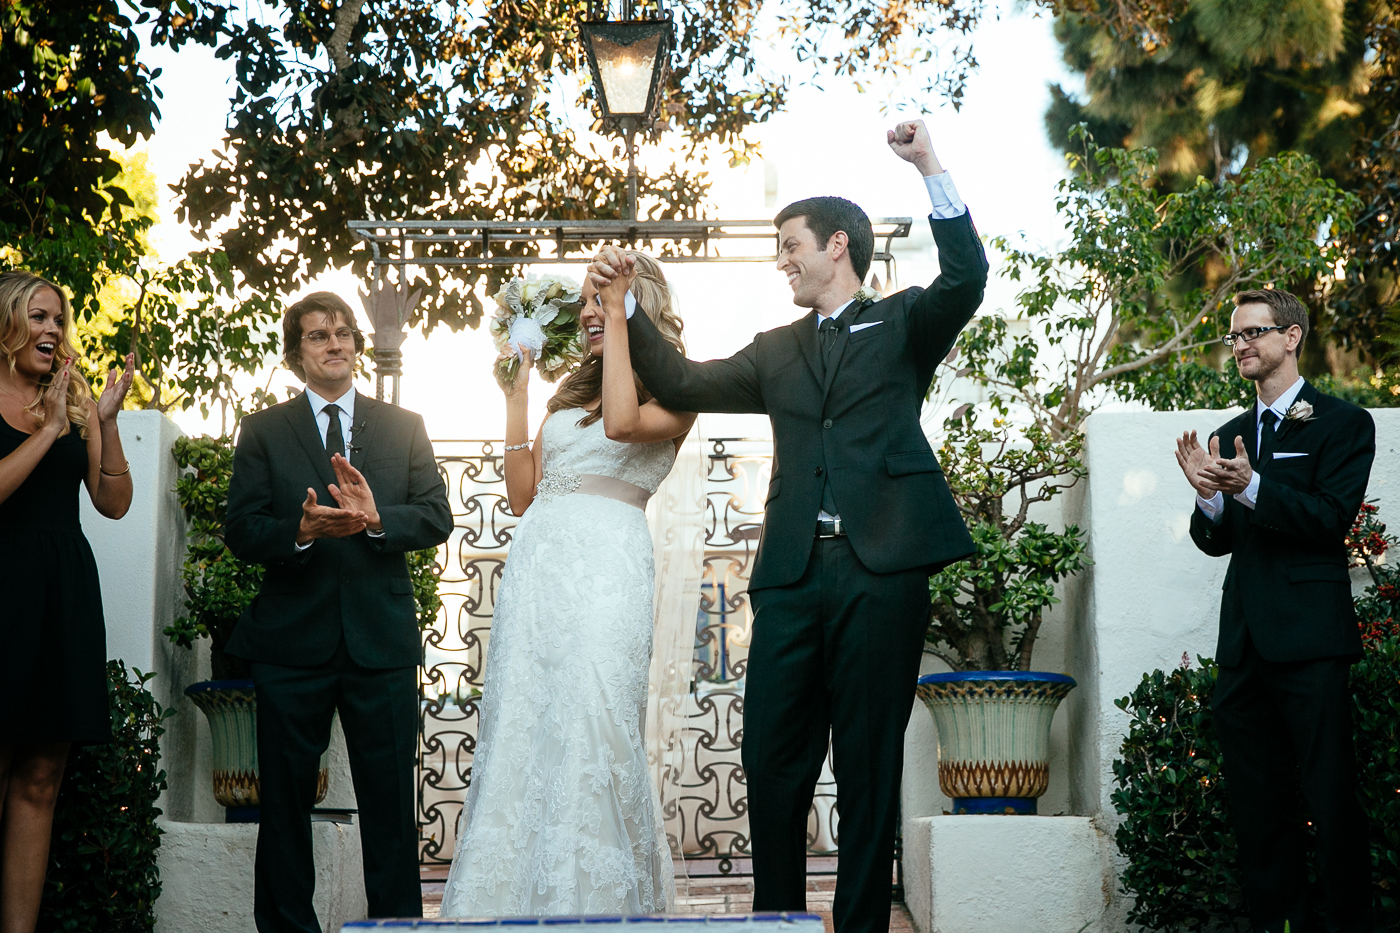 RYAN_&_KELLEY_DARLINGTON_HOUSE_WEDDING_2014_7X9A2161.JPG